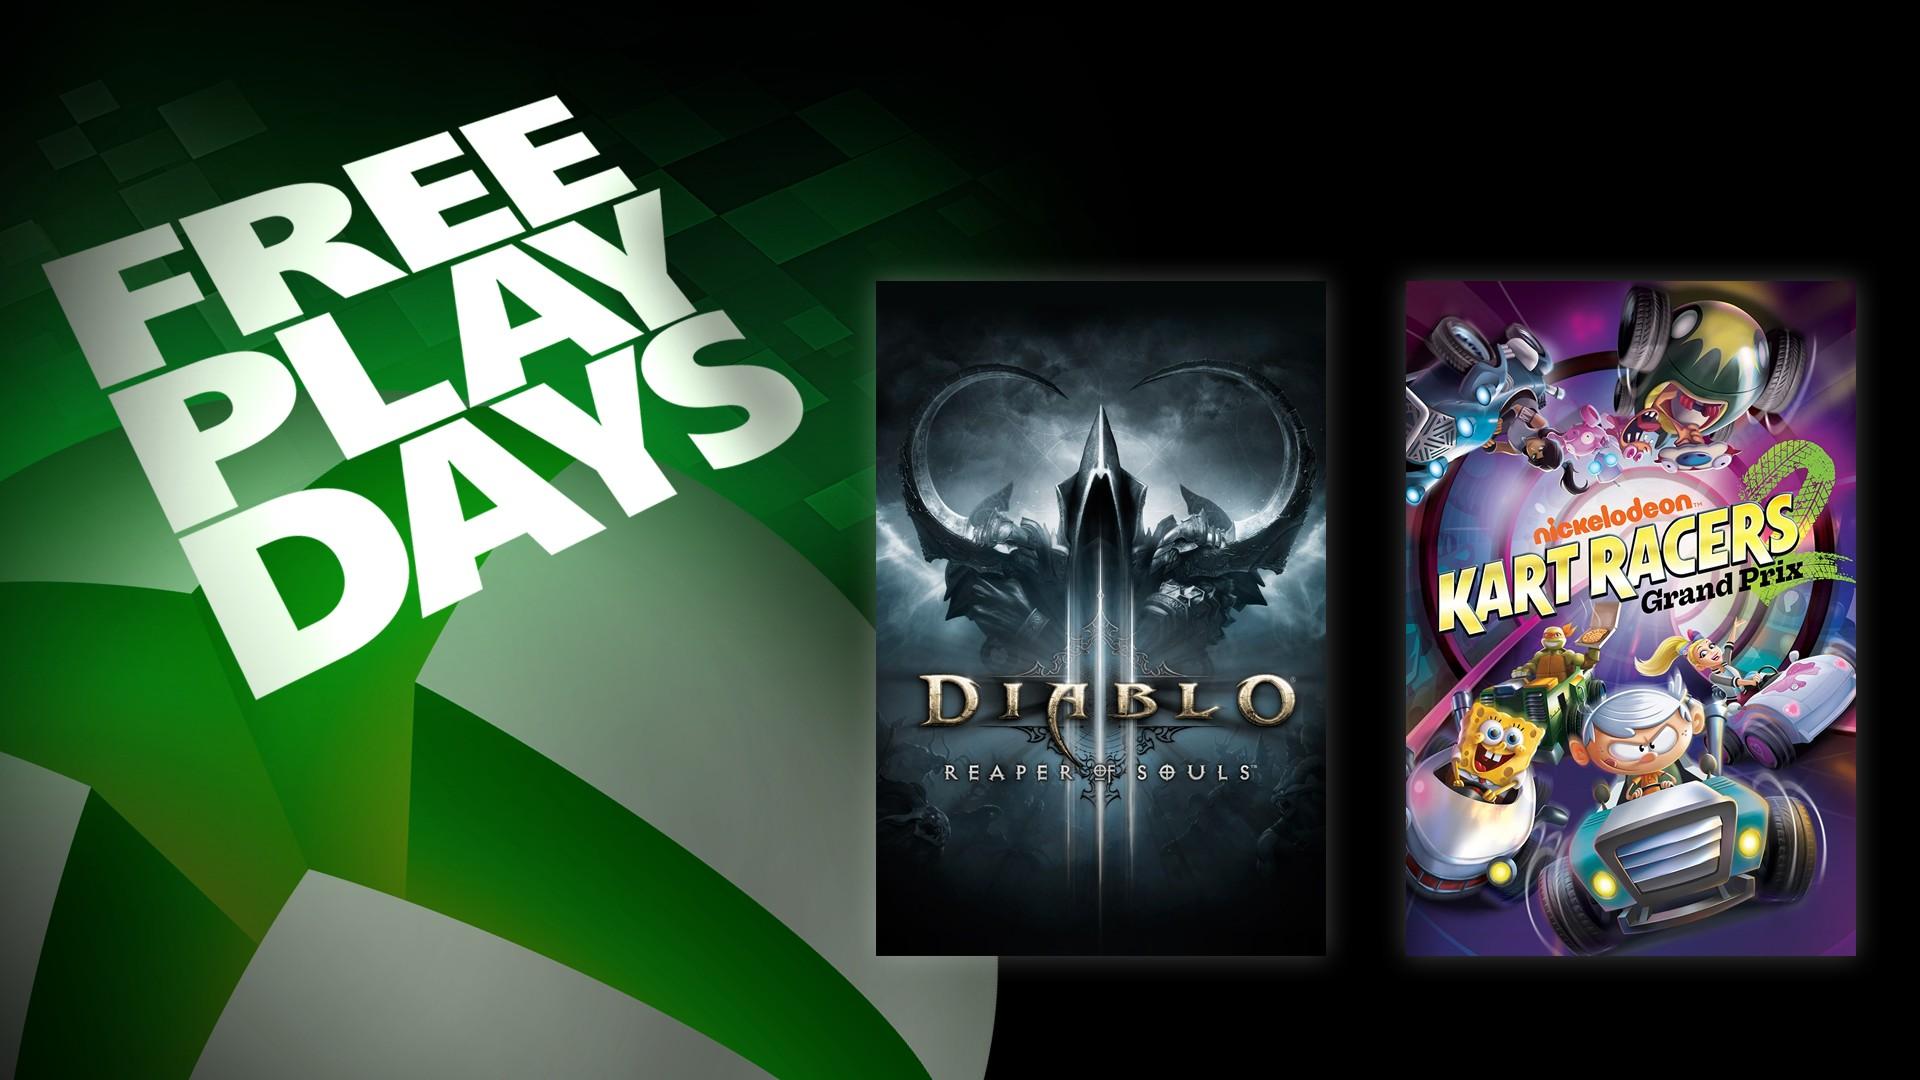 Free Play Days - February 26